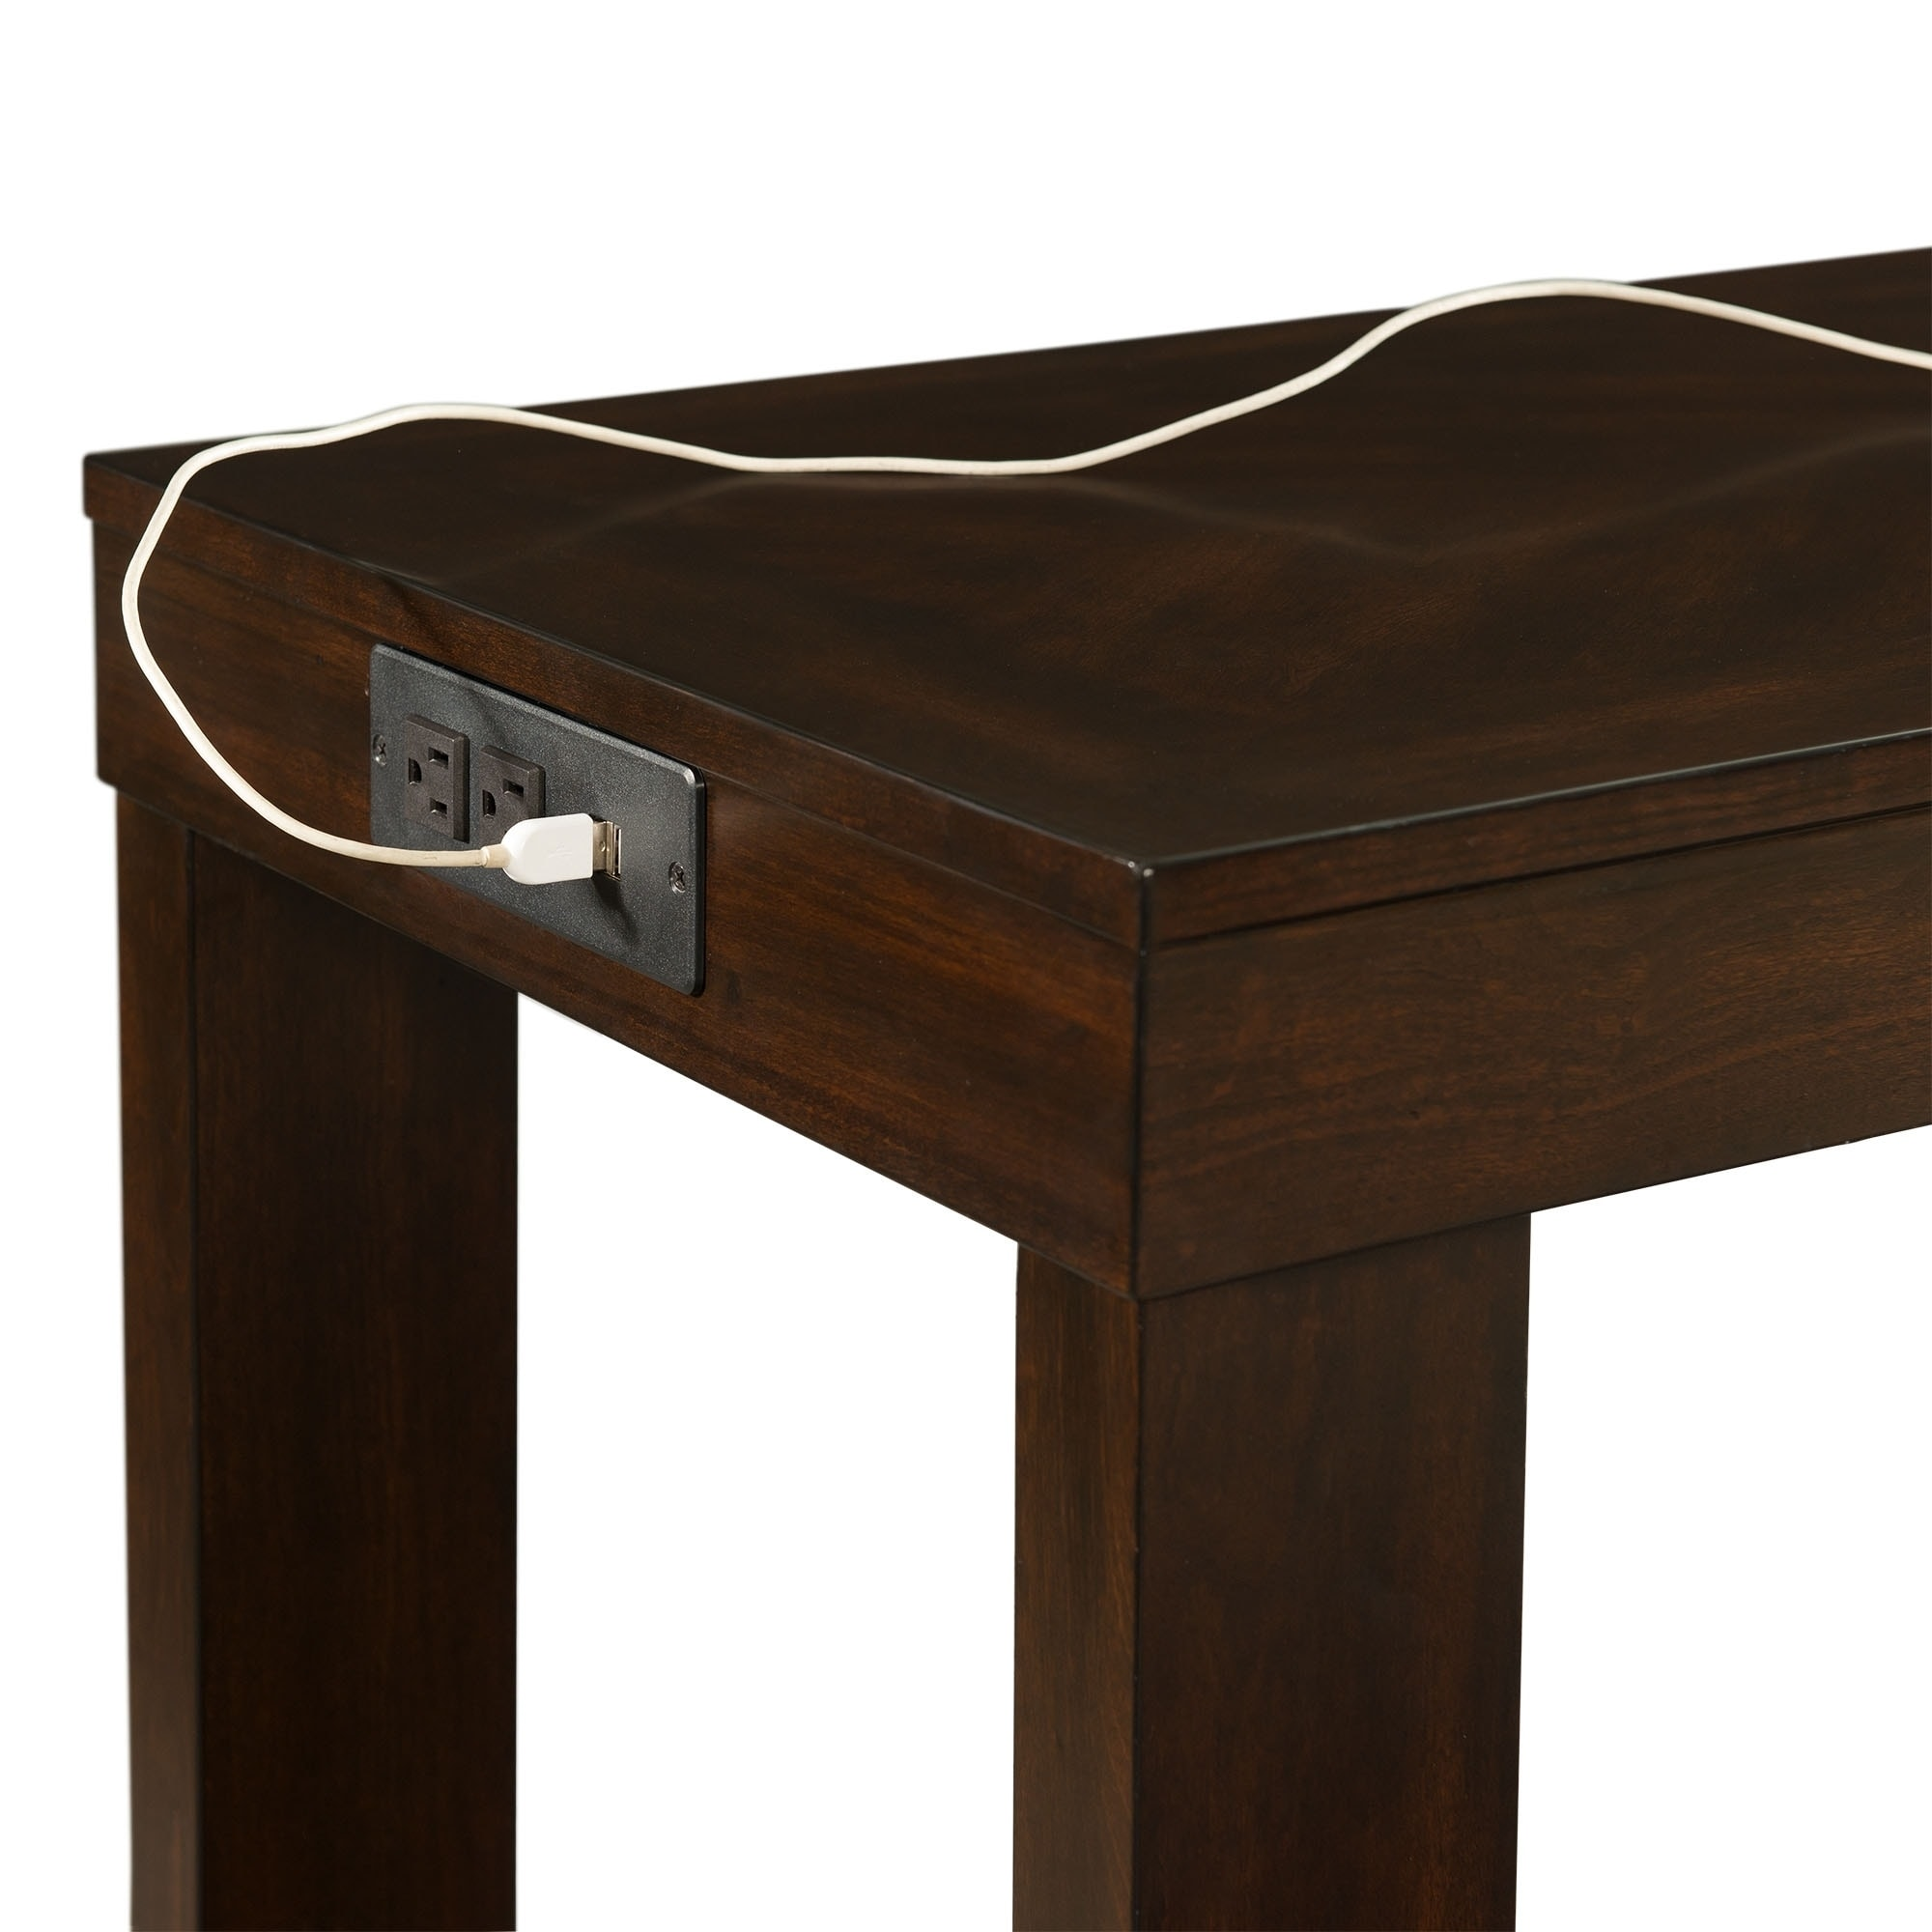 Picket House Furnishings Drew Multipurpose Bar Table Set - N/A